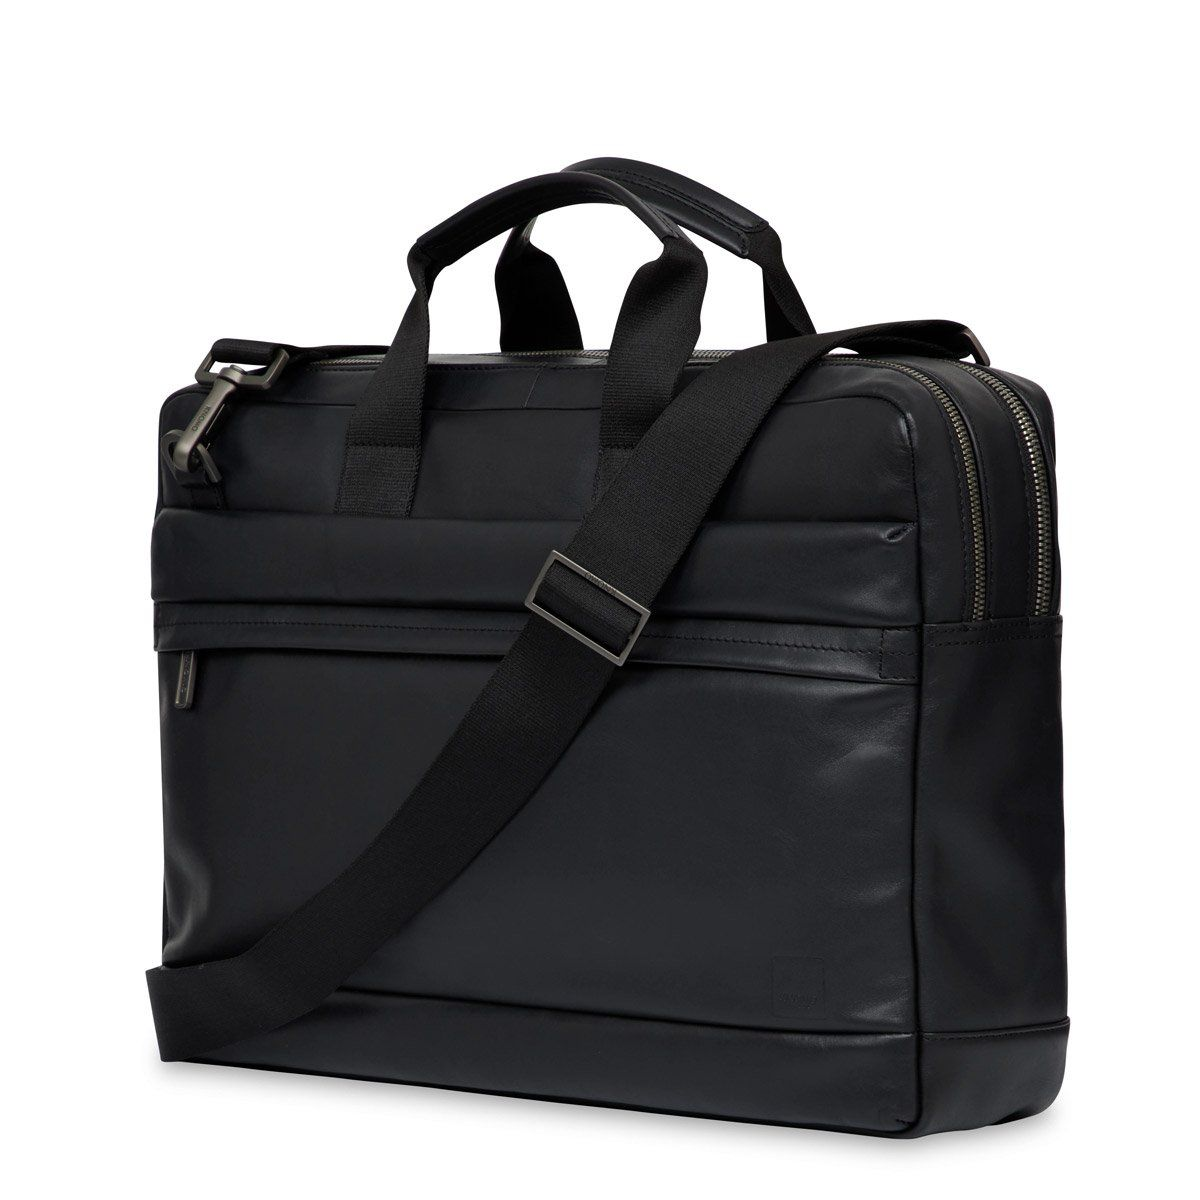 cf60a32d6 Kenneth Cole Reaction Come Bag Soon Colombian Leather Laptop Messenger Bag  - eBags.com